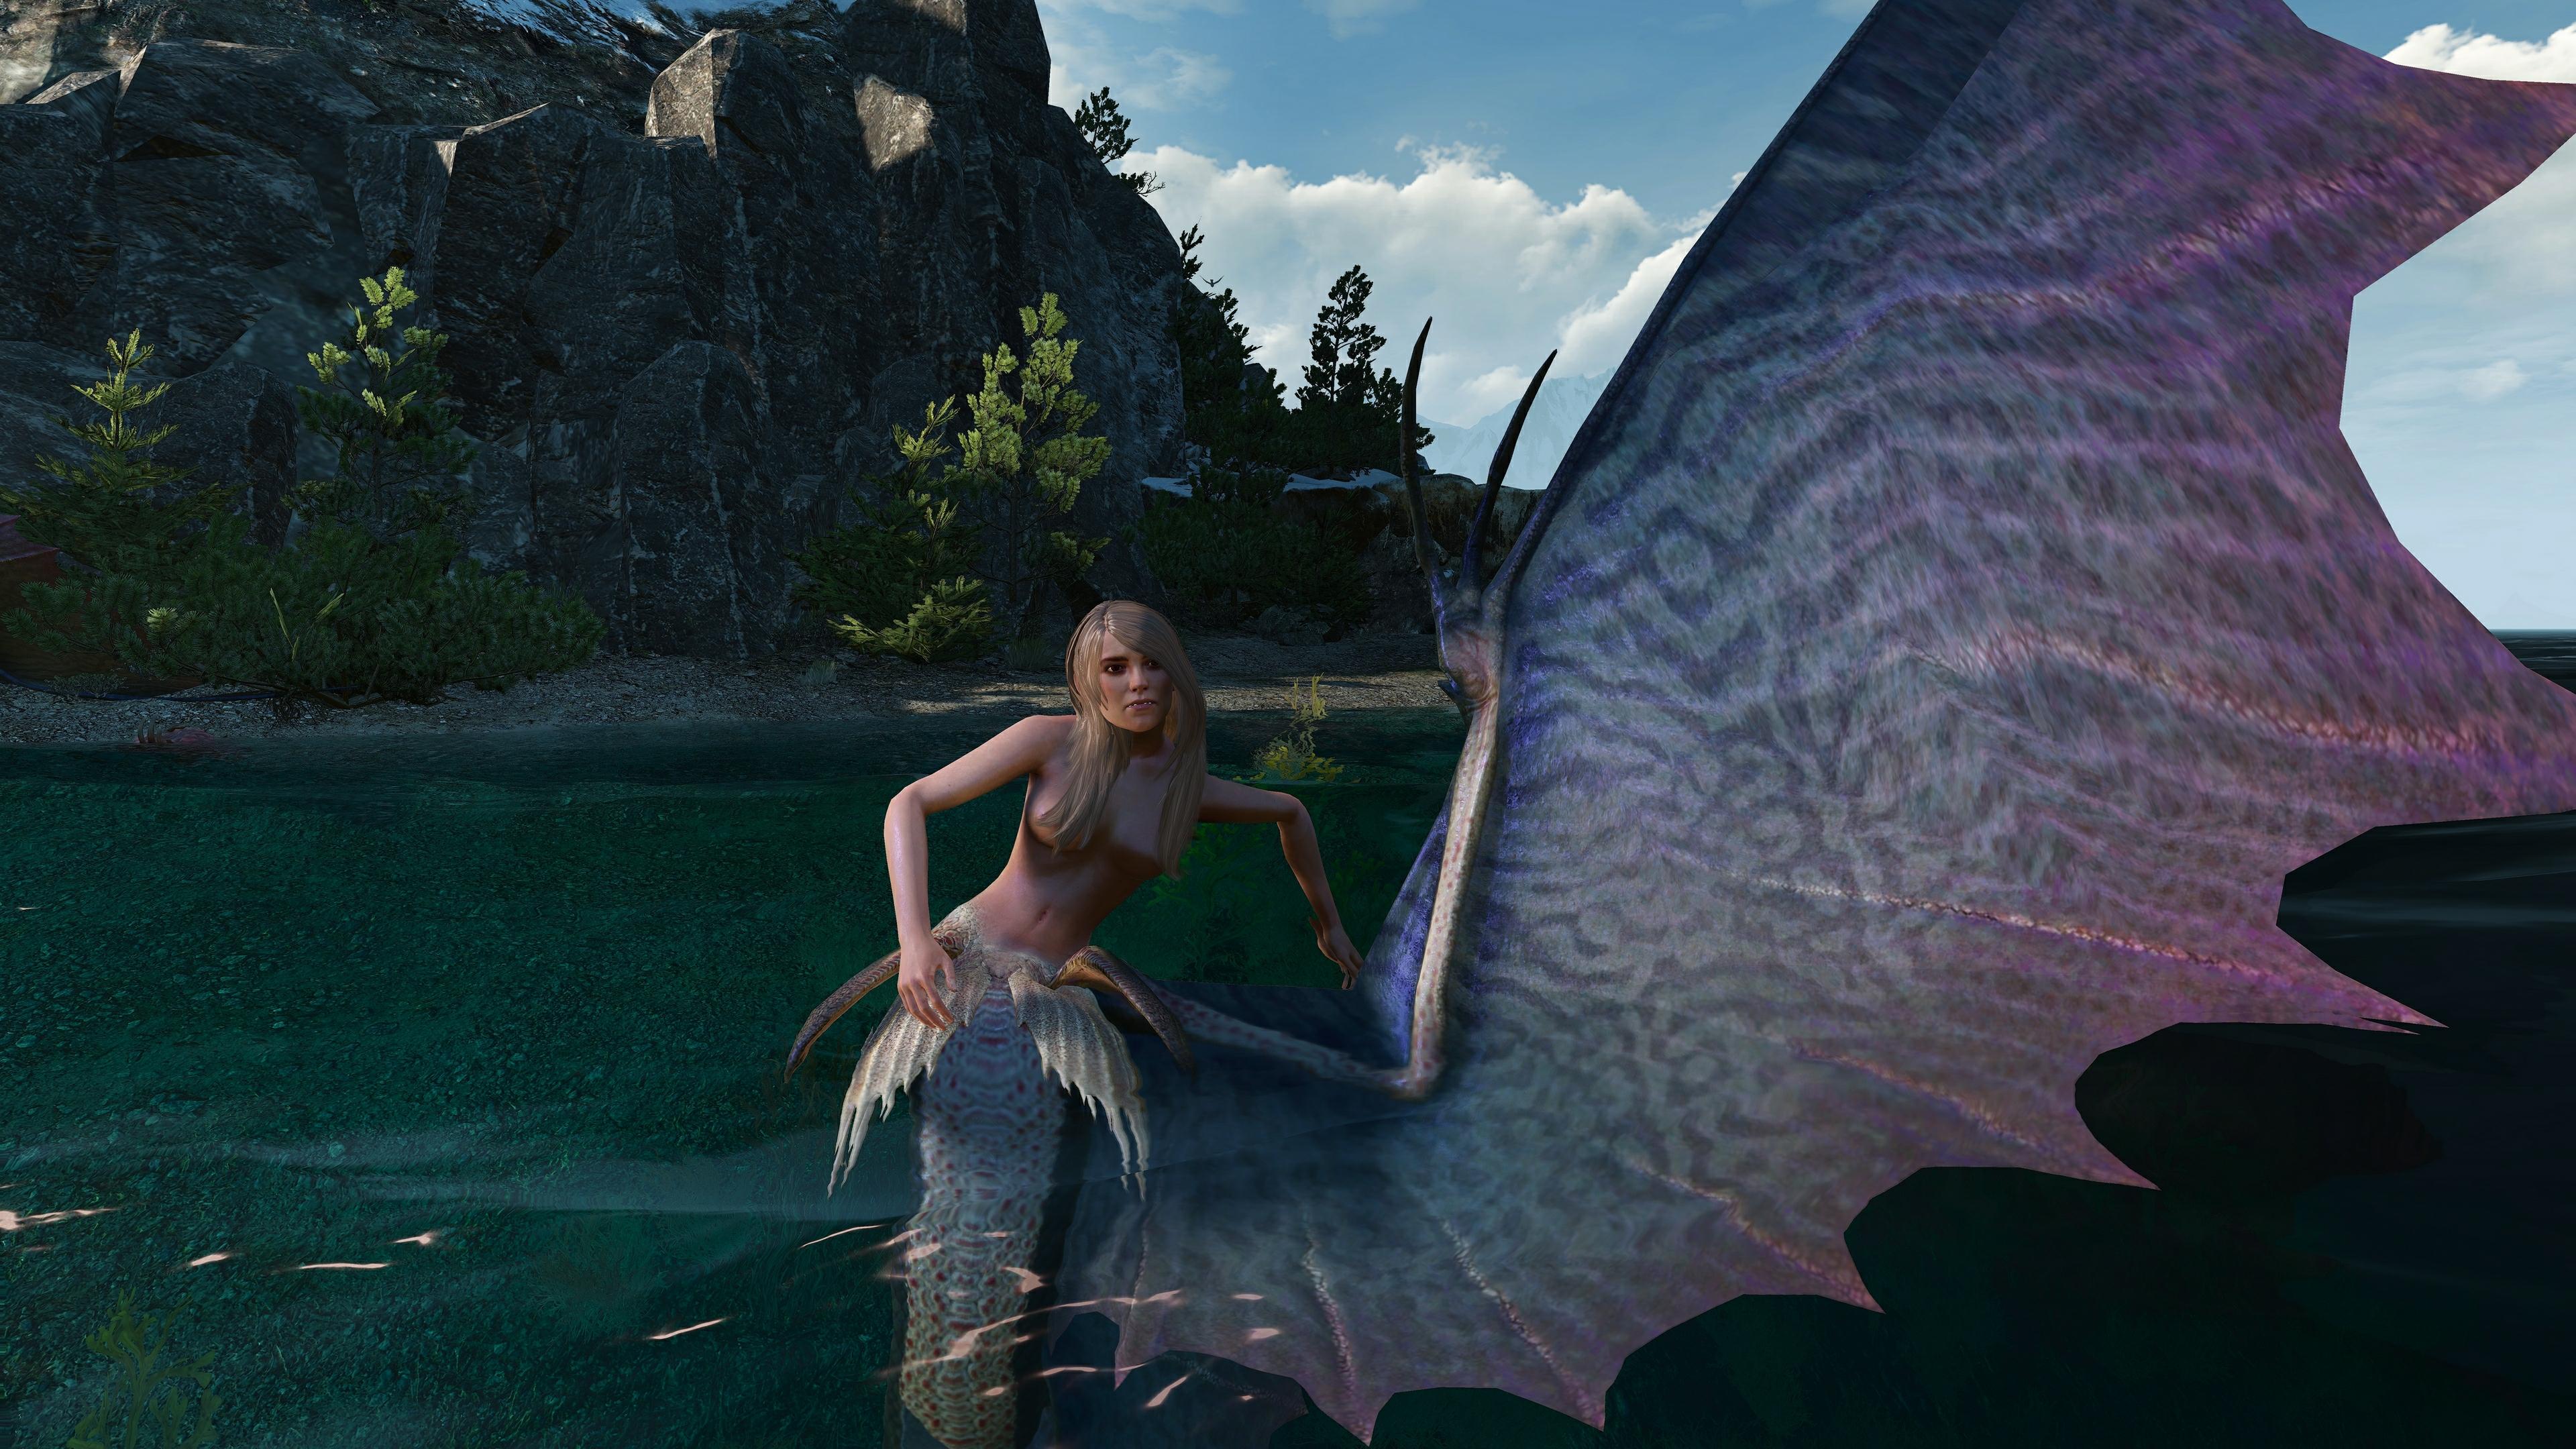 The Witcher 3 Screenshot  2020.07.26 - 13.10.35.62.jpg - The Witcher 3: Wild Hunt